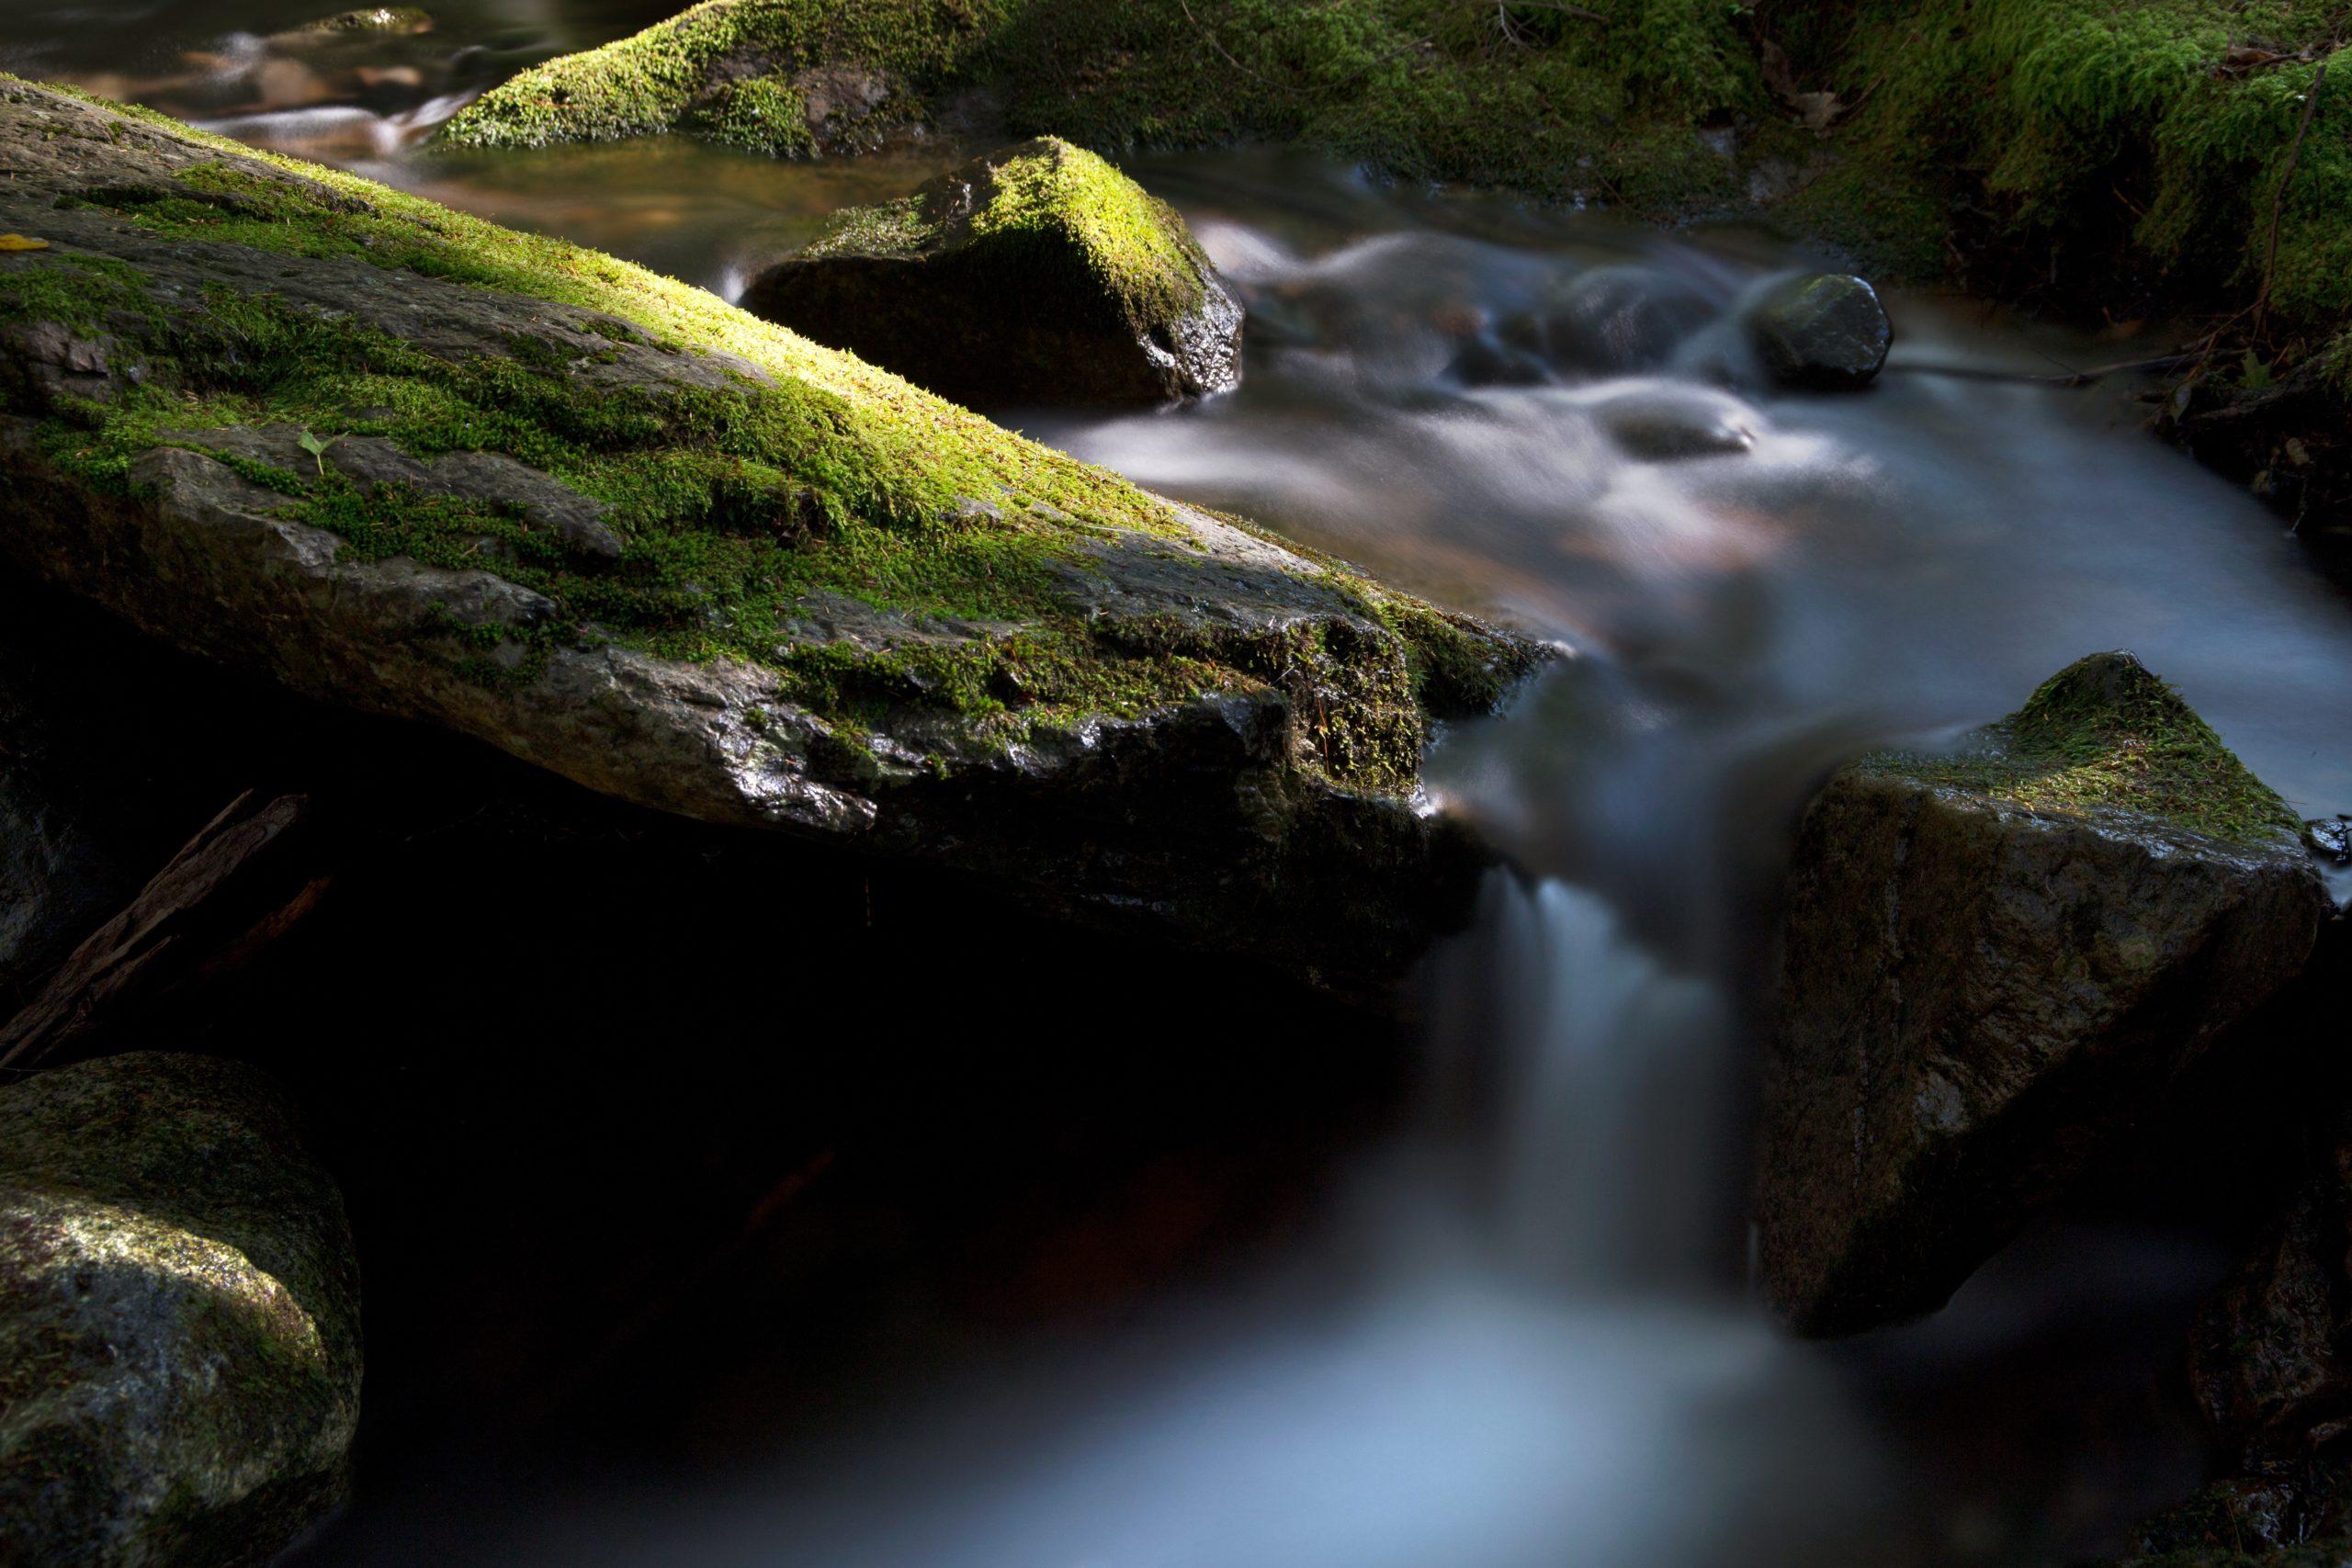 Healthinfoods | Complementos Nutricionales | Envío Gratis boulders environment flow 589687 scaled